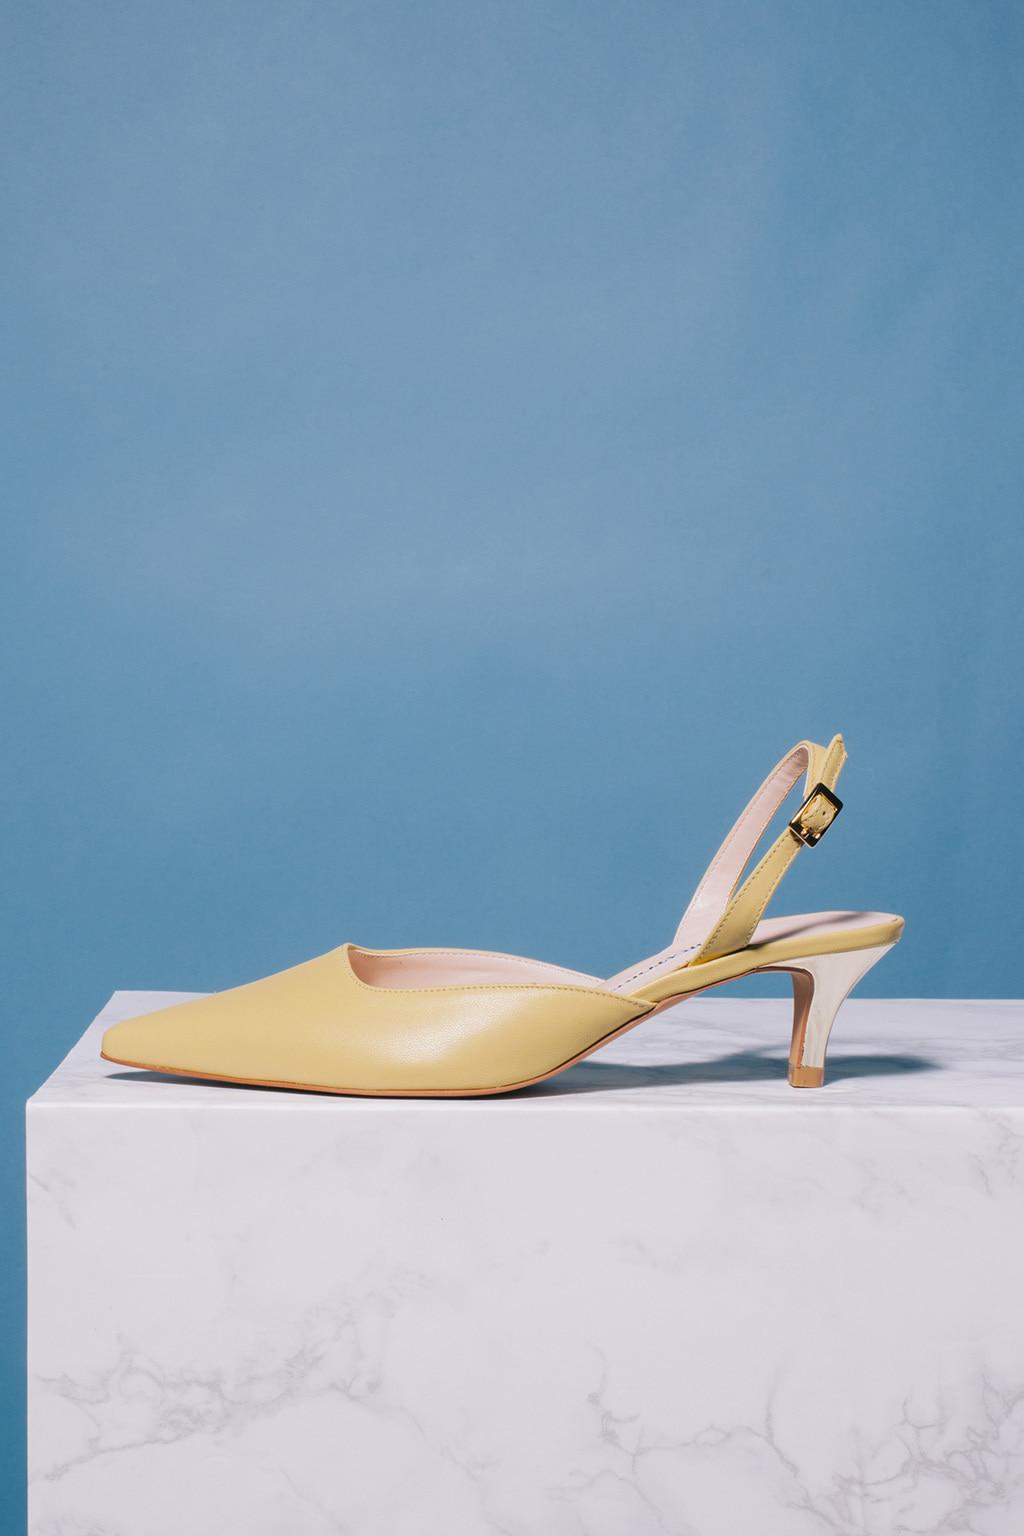 DORATORE Savona YEGD - Women's Shoes : Republic of Korea